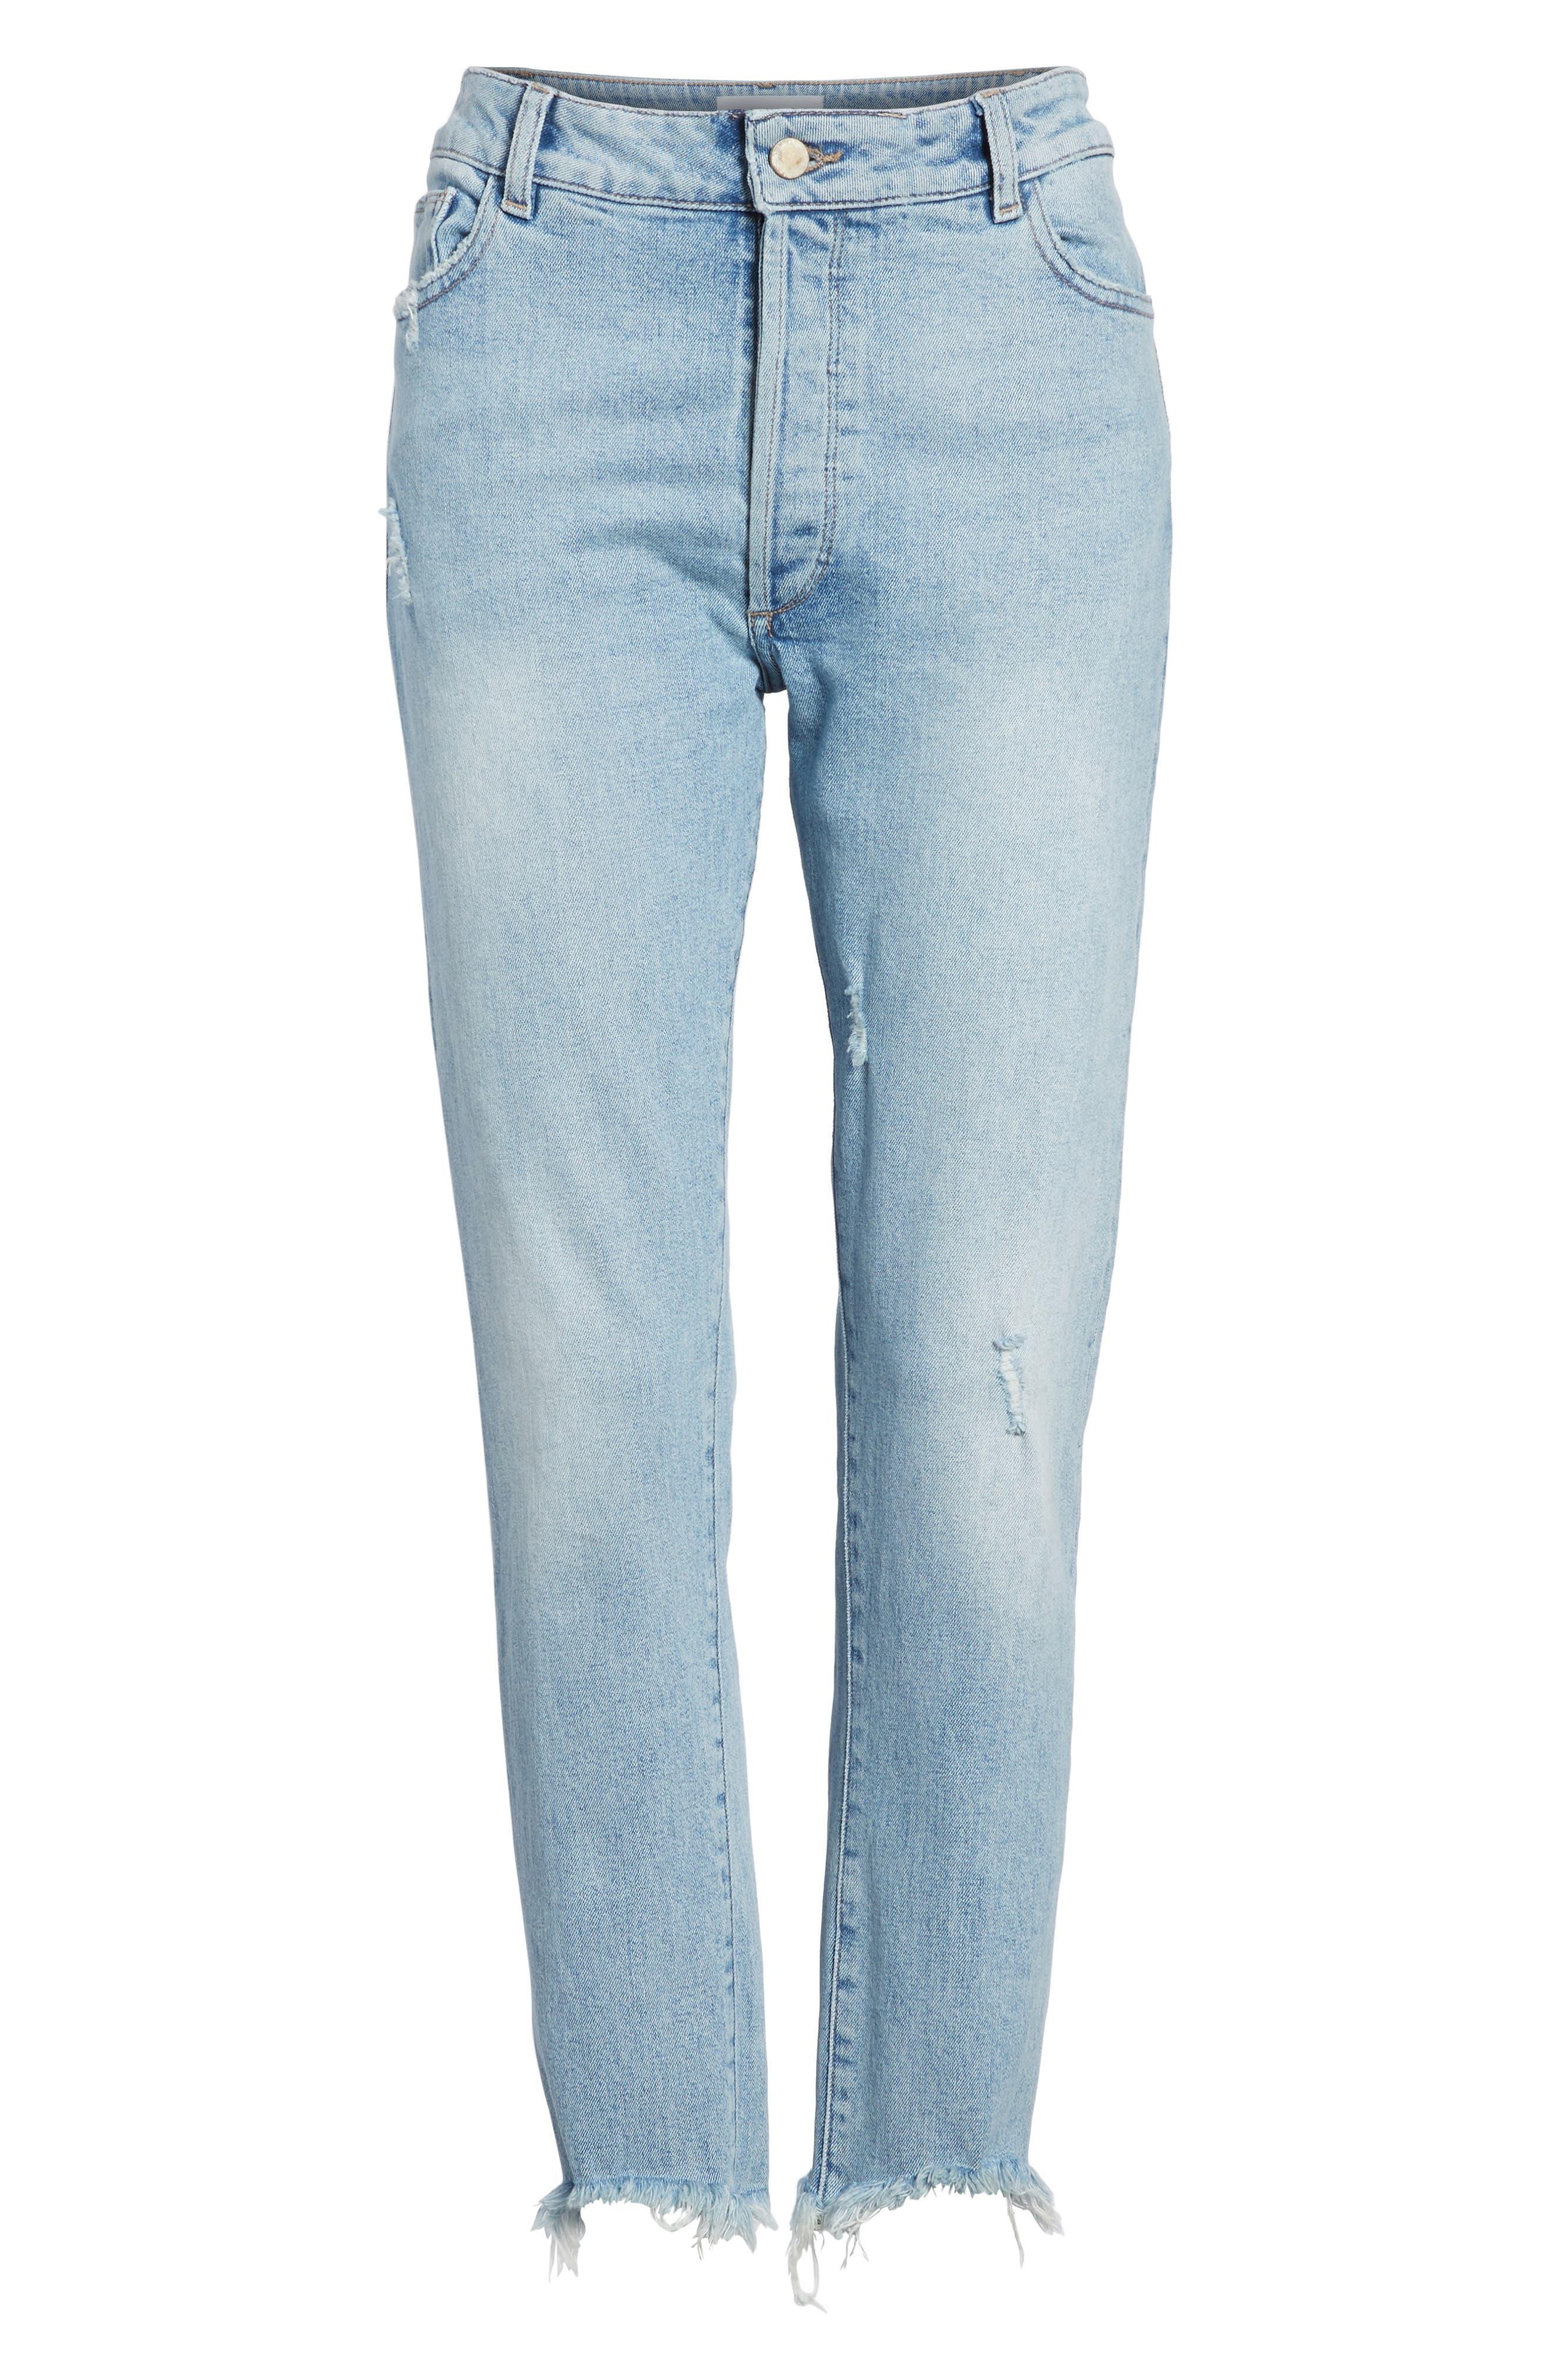 Bella Vintage Crop Slim Jeans,                             Alternate thumbnail 7, color,                             Super Bleach